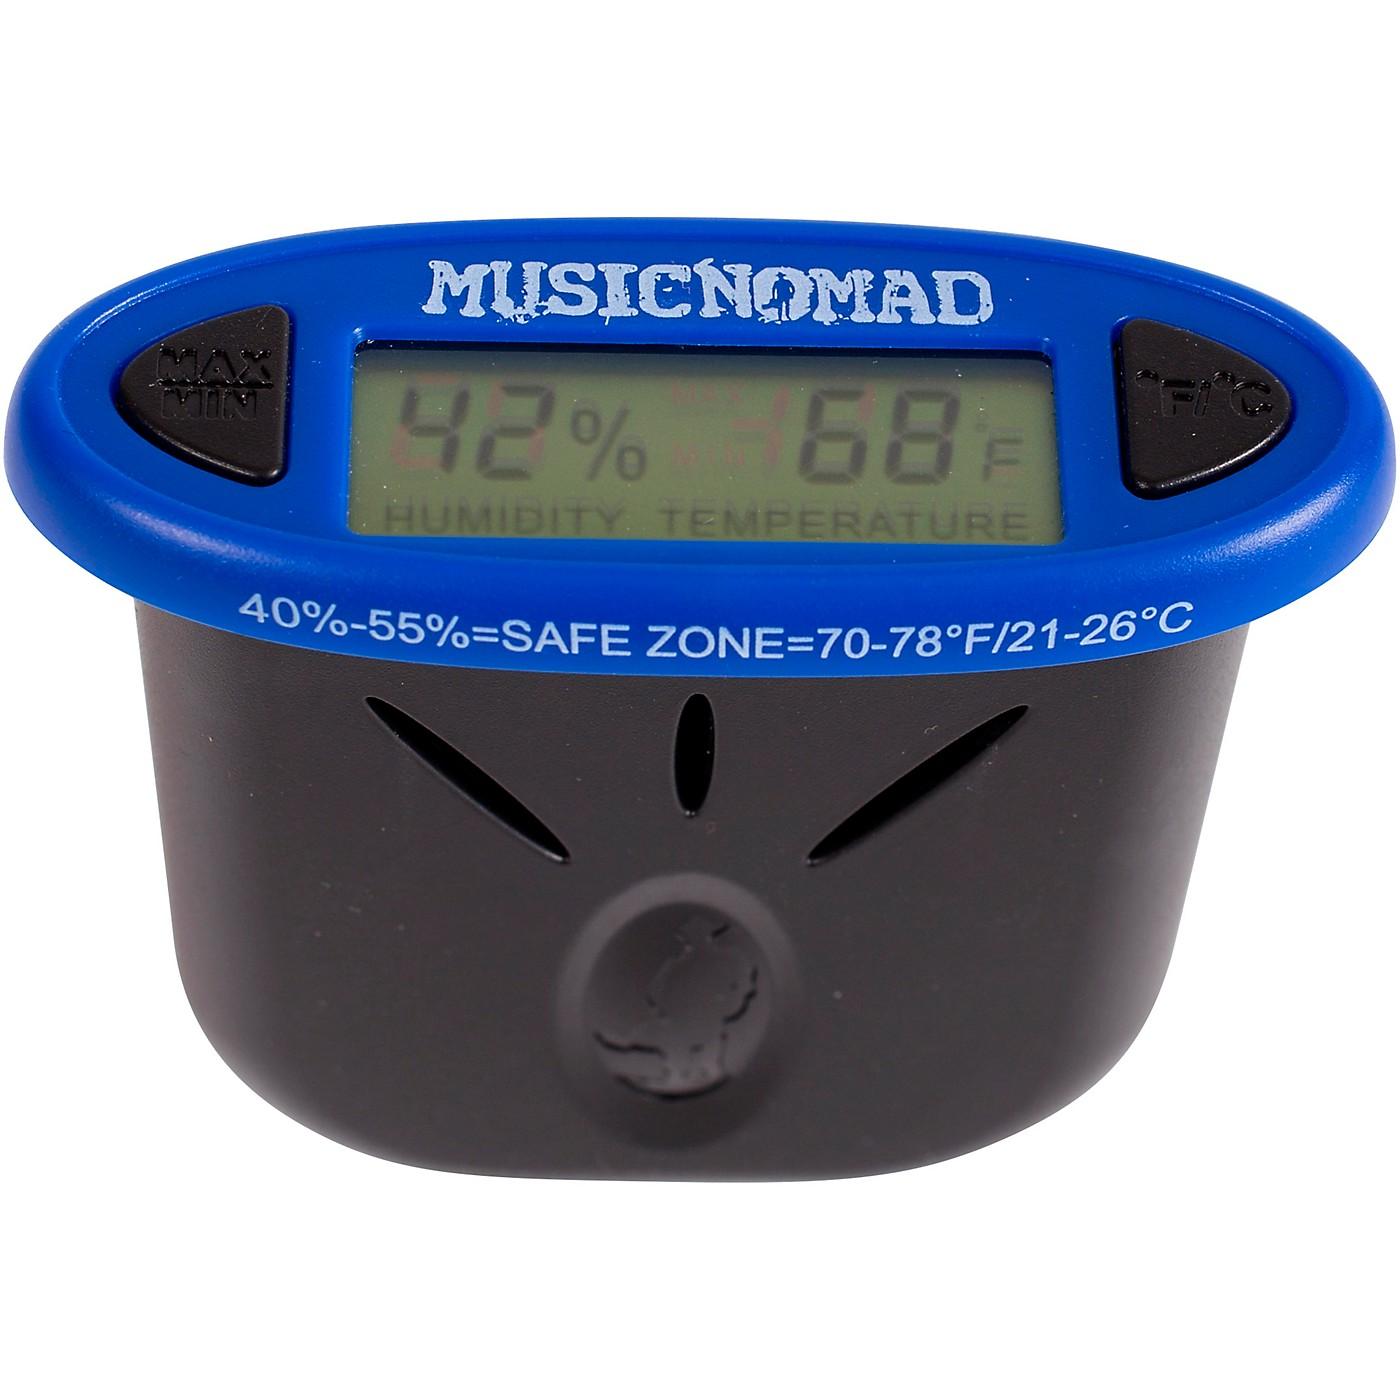 Music Nomad HumiReader - Humidity & Temperature Monitor 3 in 1 thumbnail